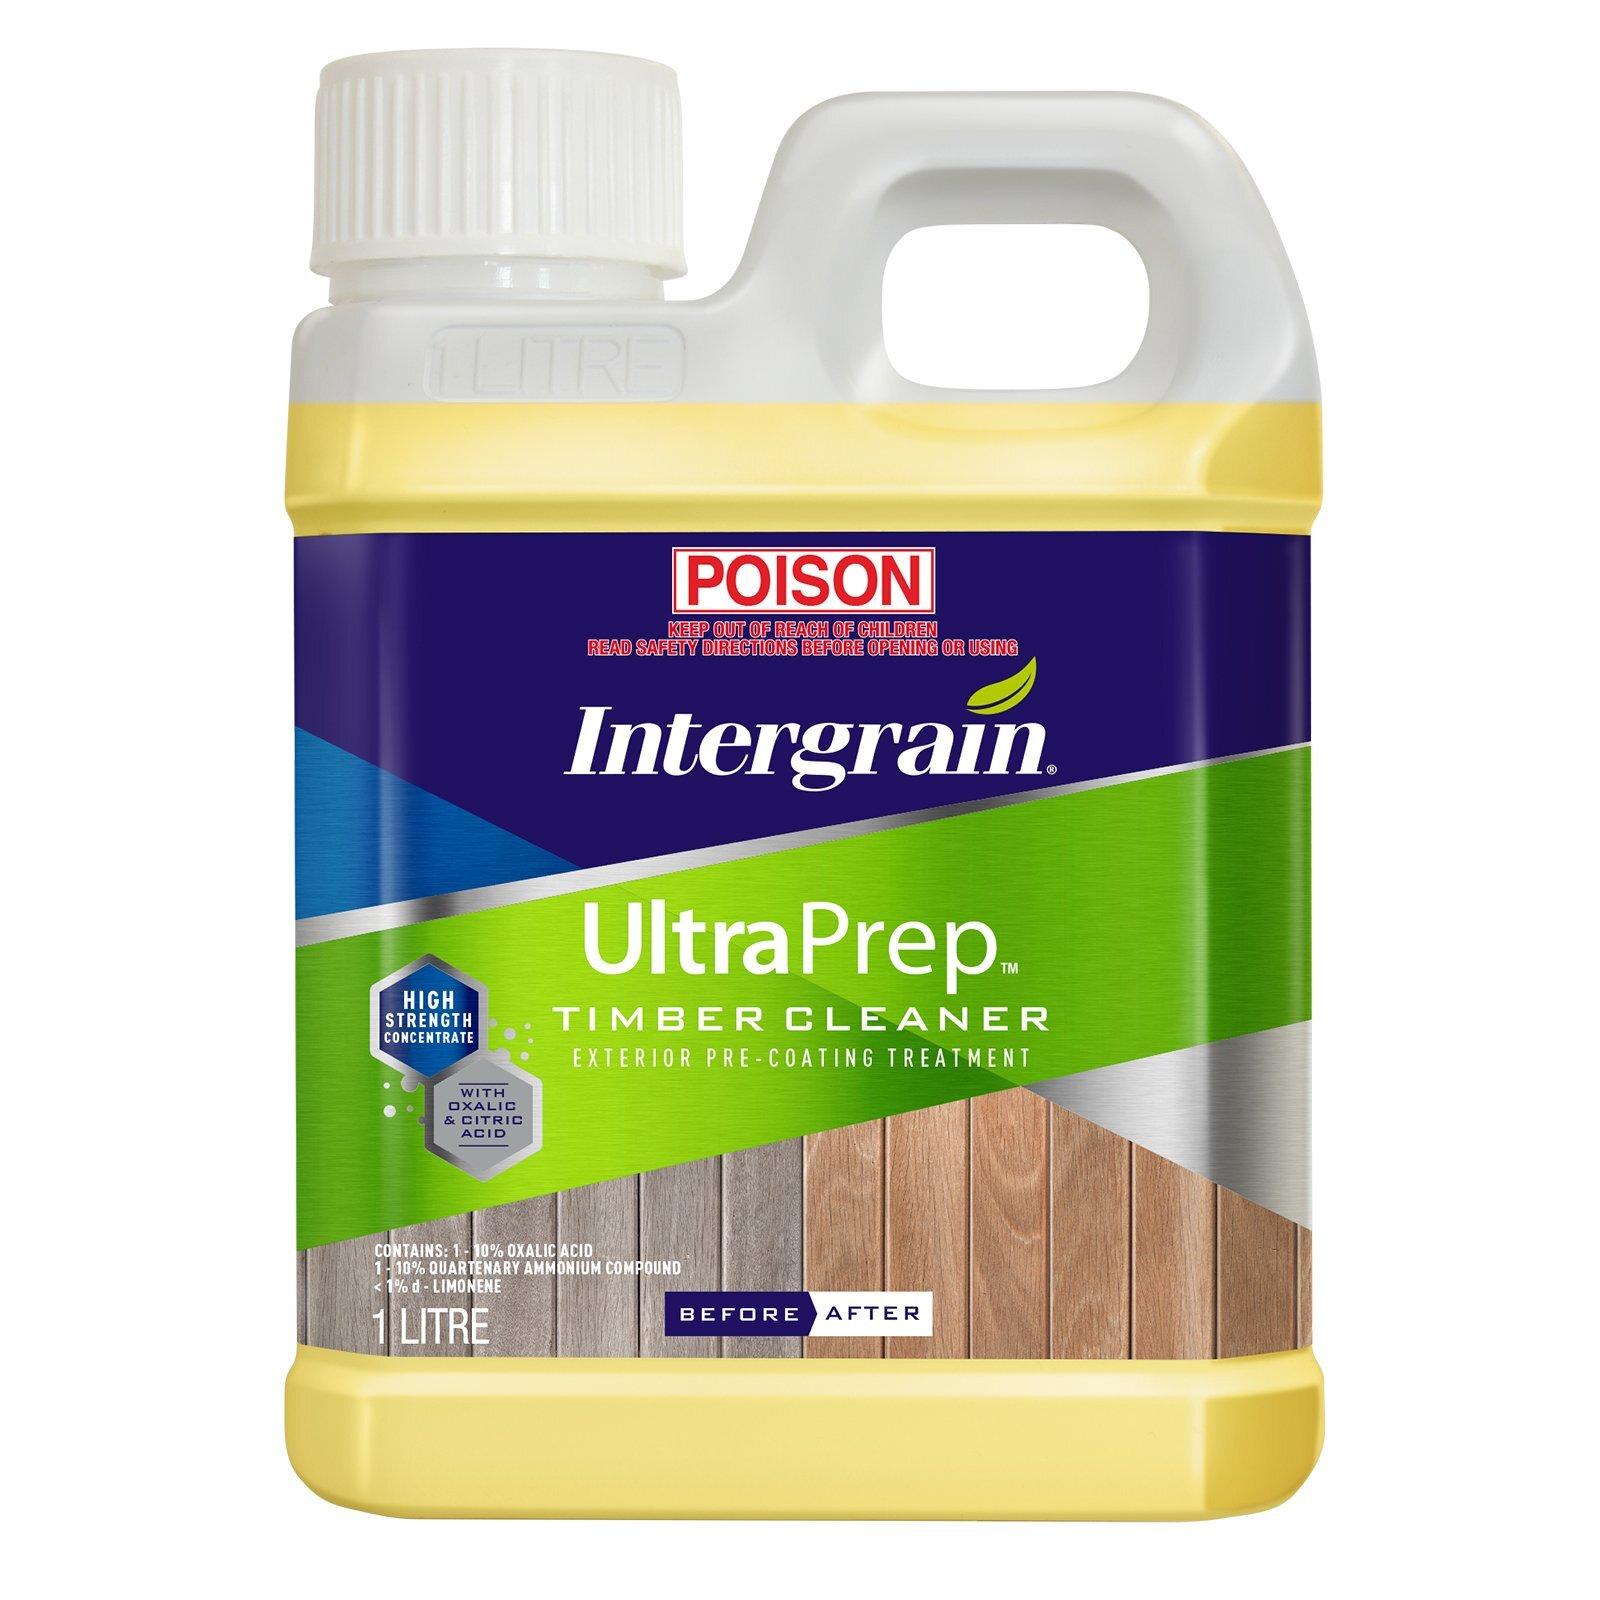 Intergrain 1L UltraPrep Timber Cleaner